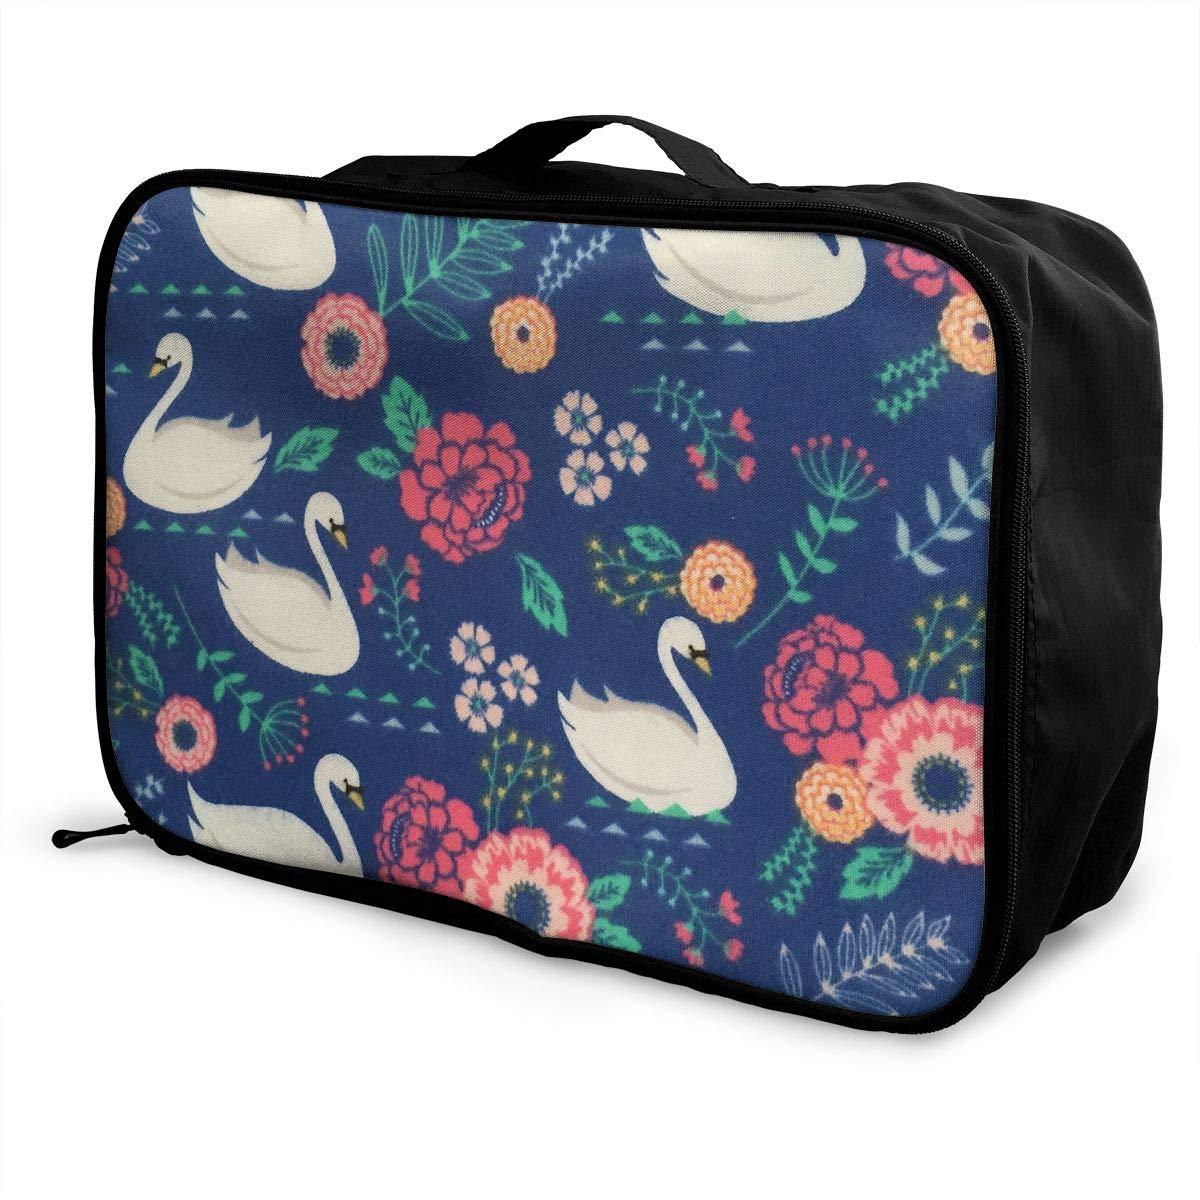 Travel Luggage Duffle Bag Lightweight Portable Handbag Swan Print Large Capacity Waterproof Foldable Storage Tote